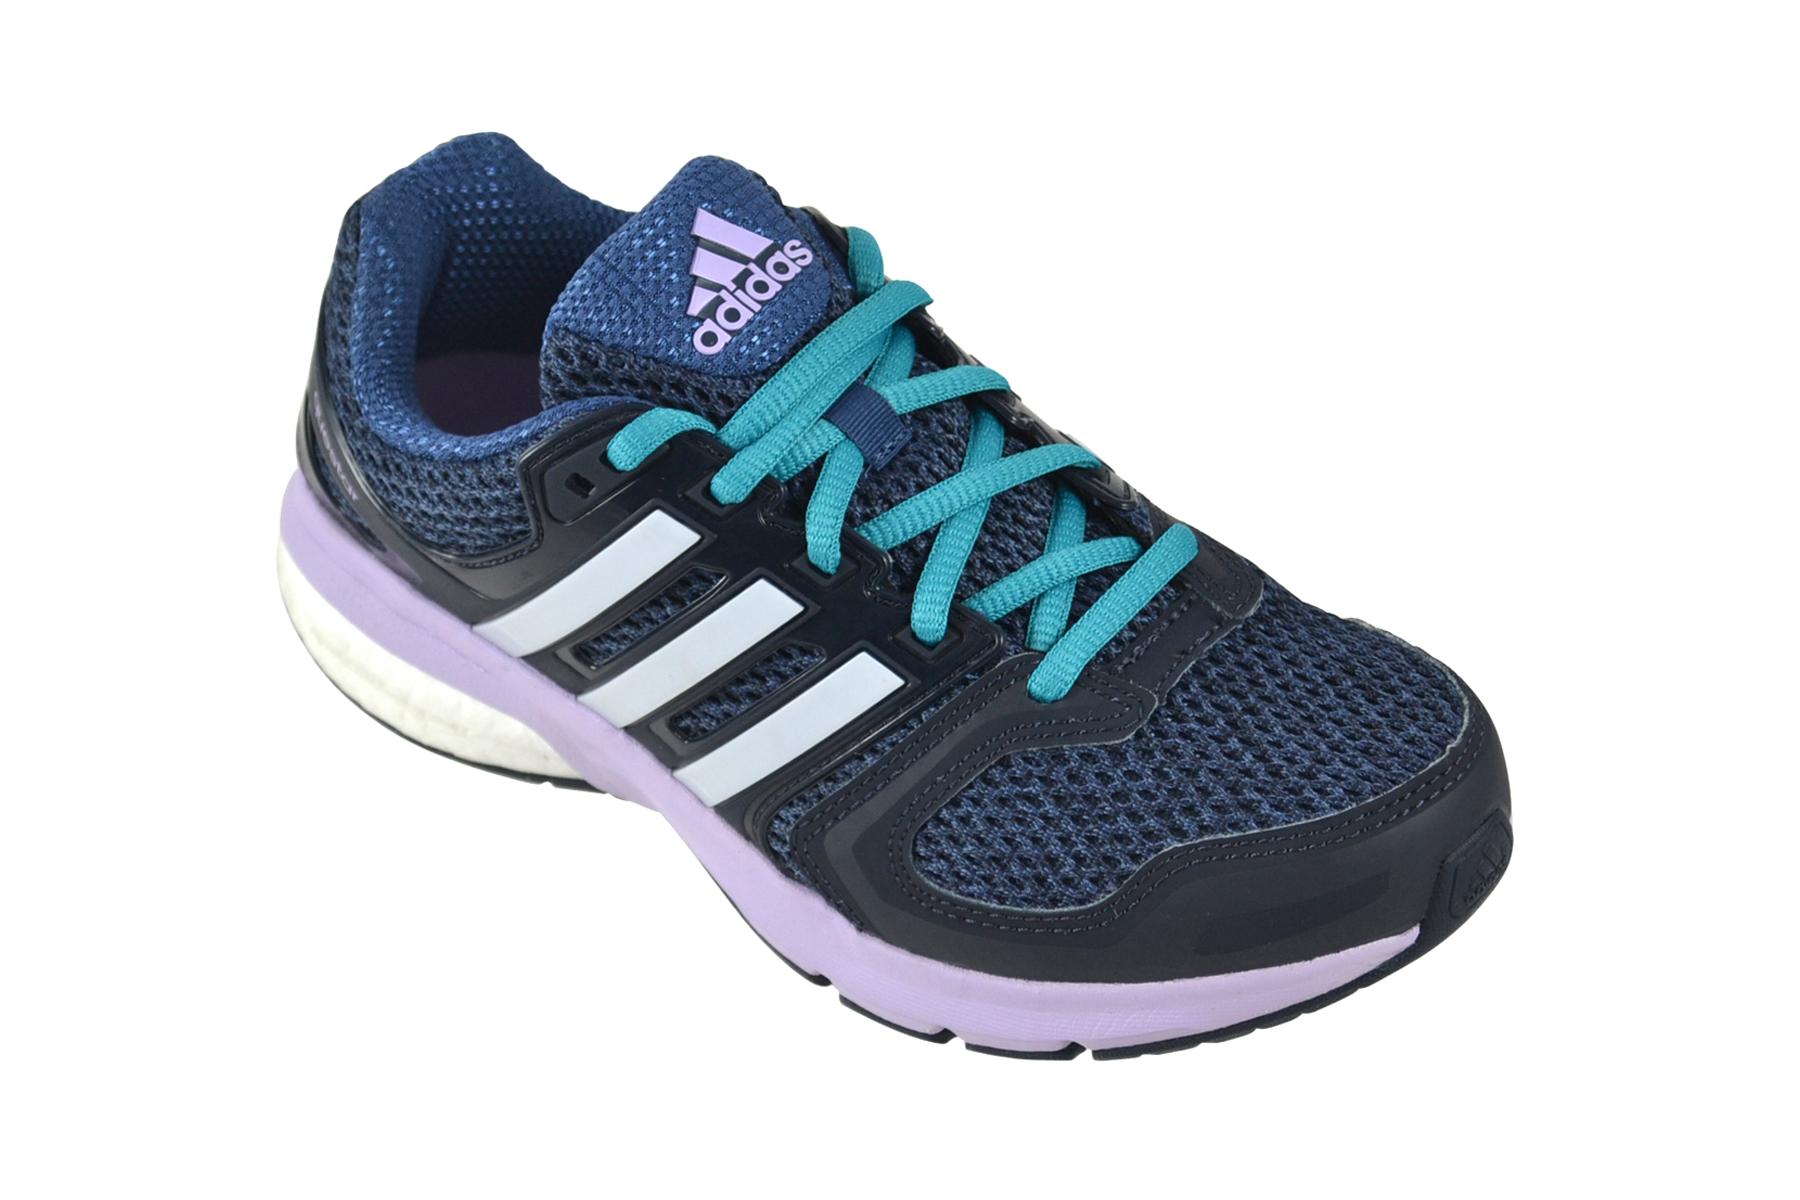 Adidas Questar damen ftwwht purglo Turnschuhe Schuhe blau